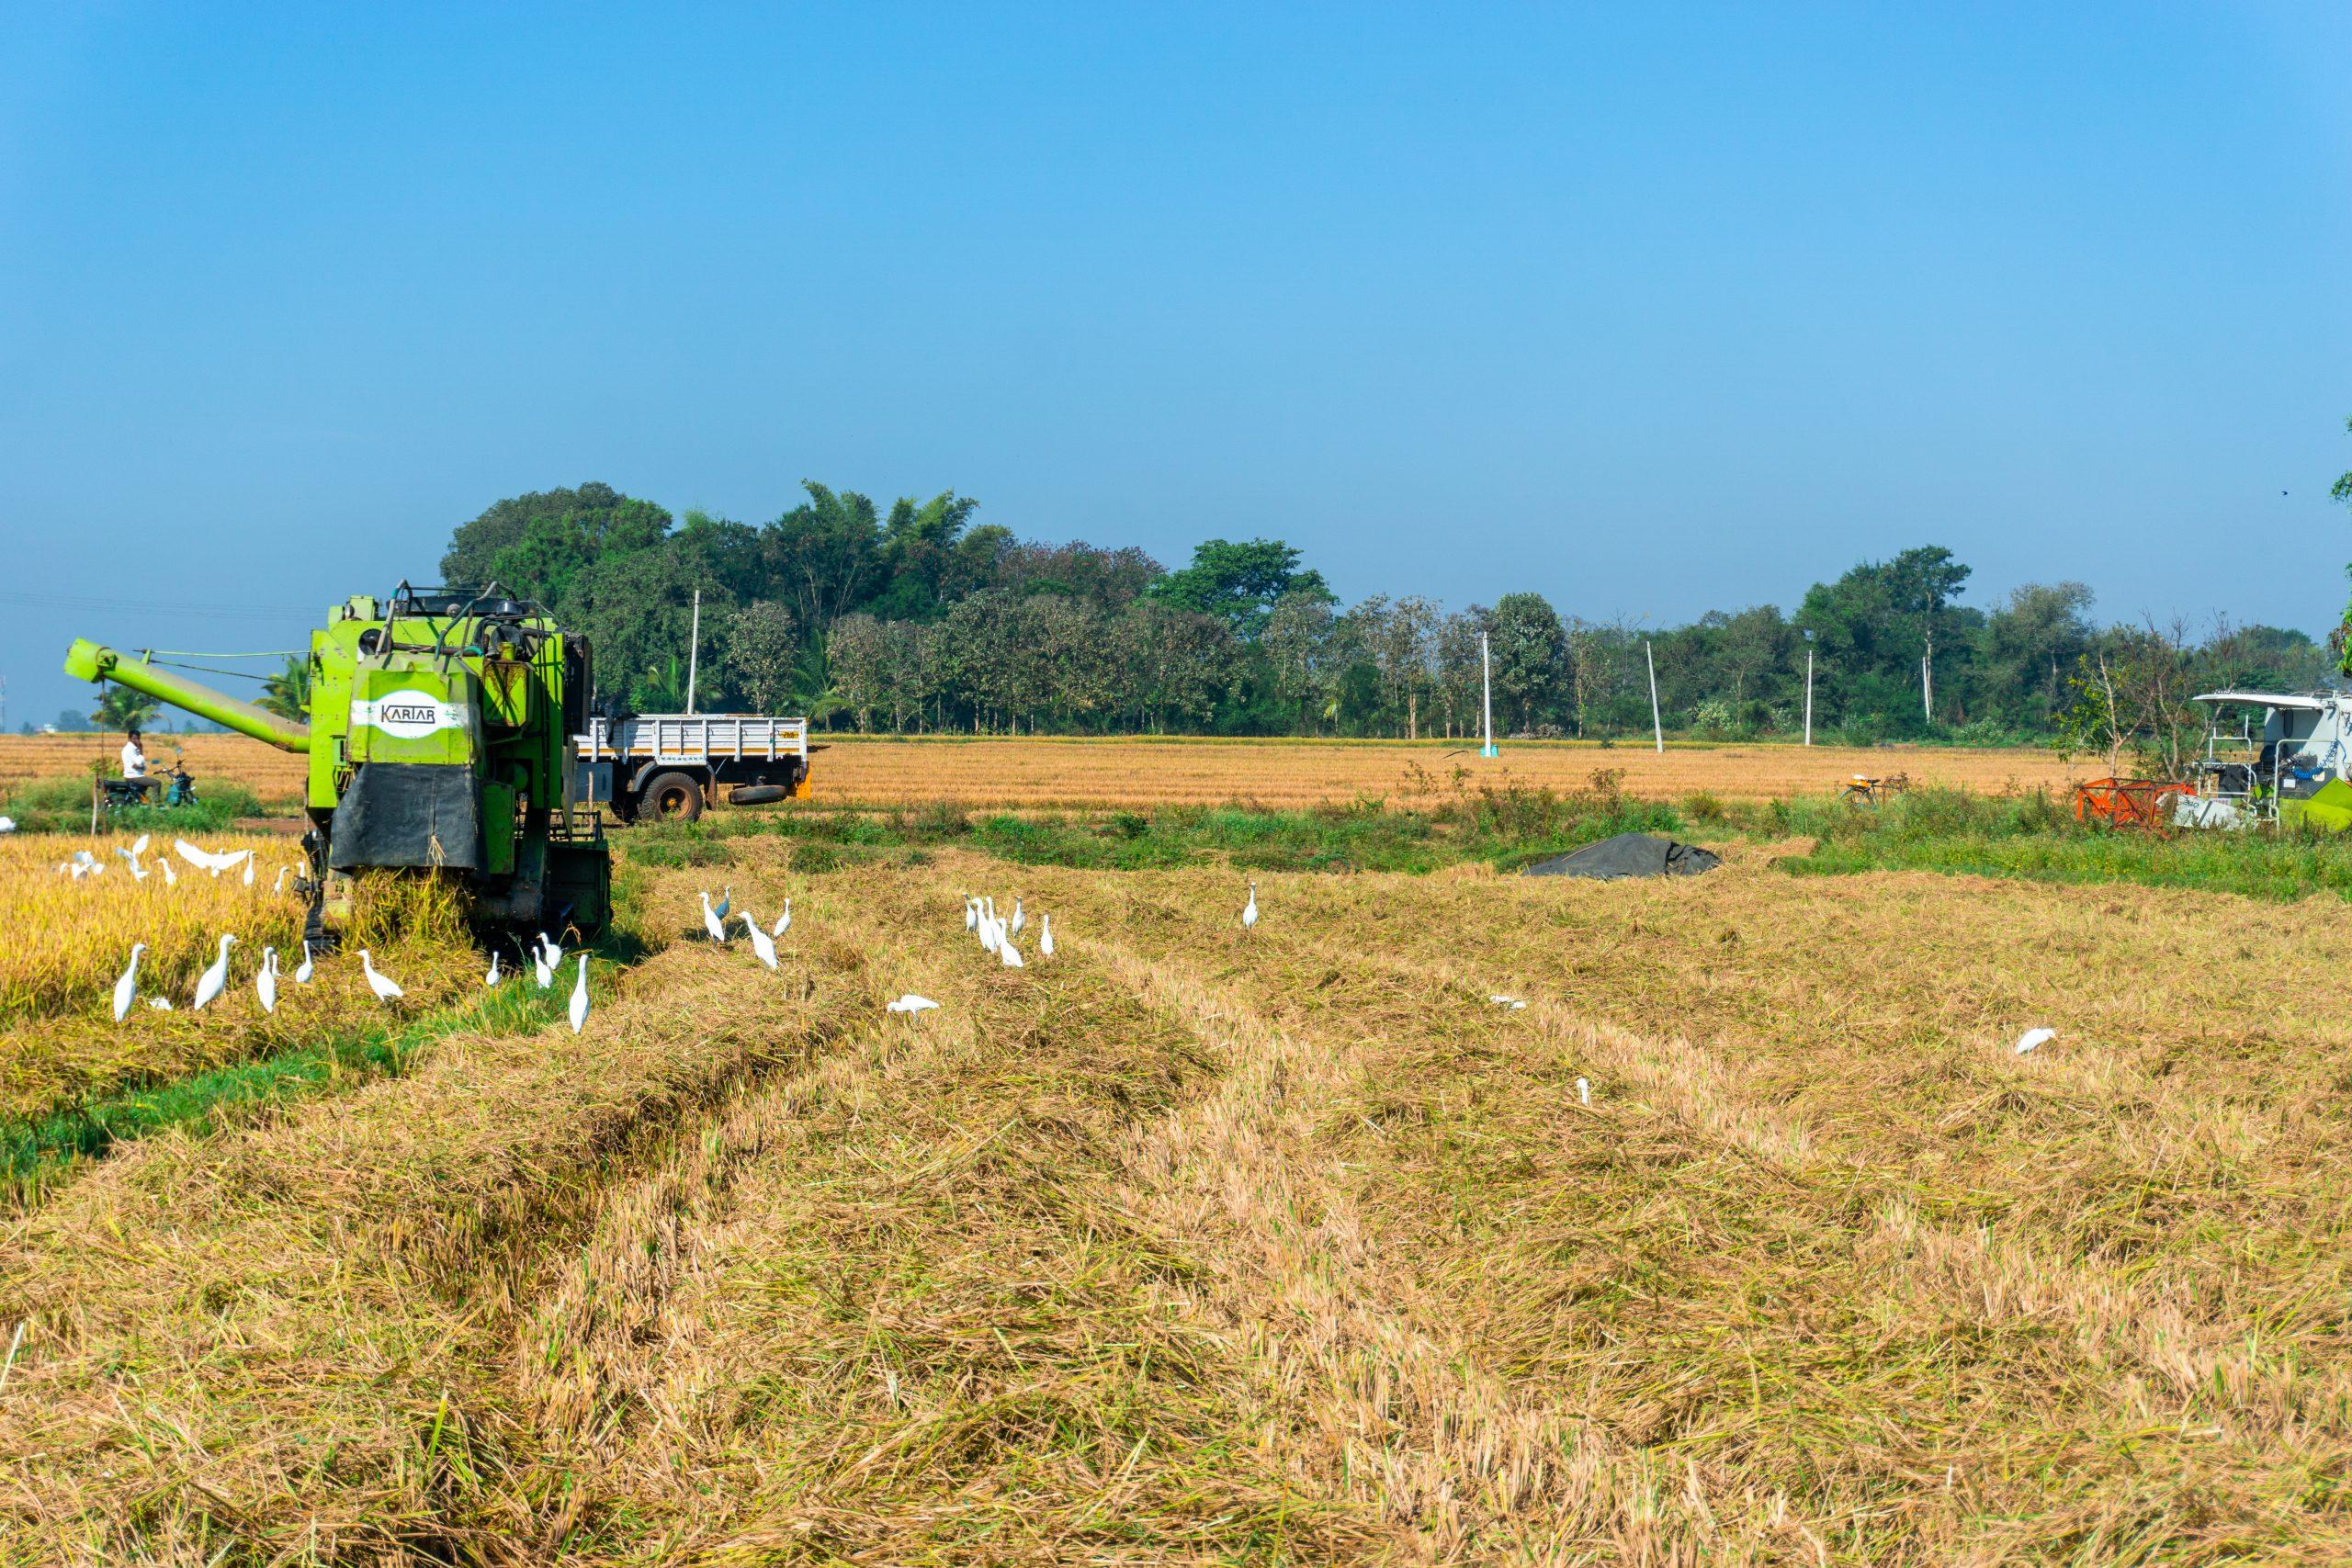 An harvester cutting crops